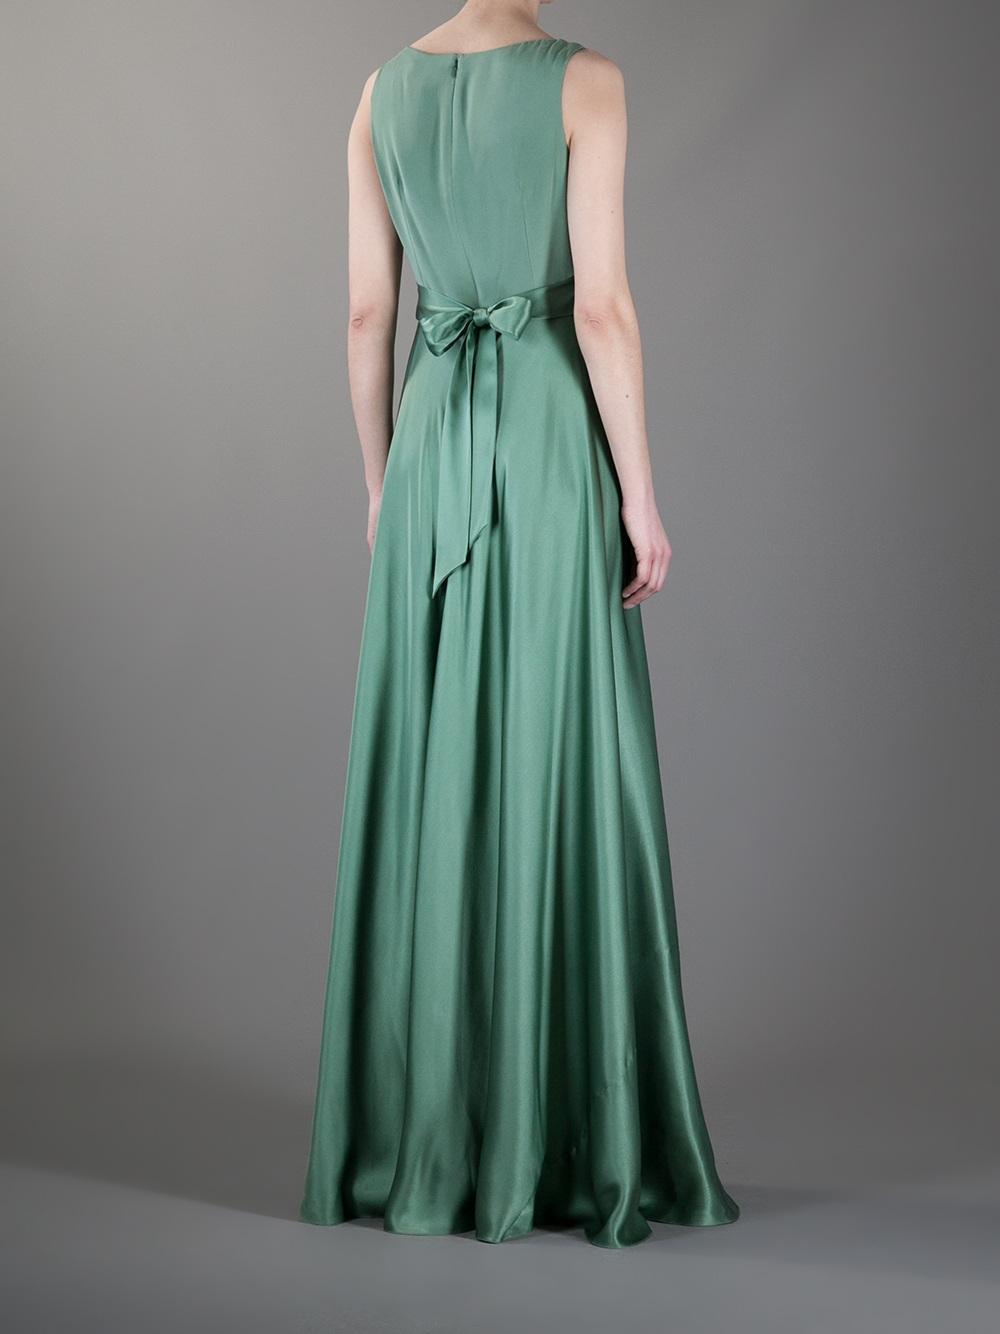 Lyst Temperley London Stella Evening Dress In Green